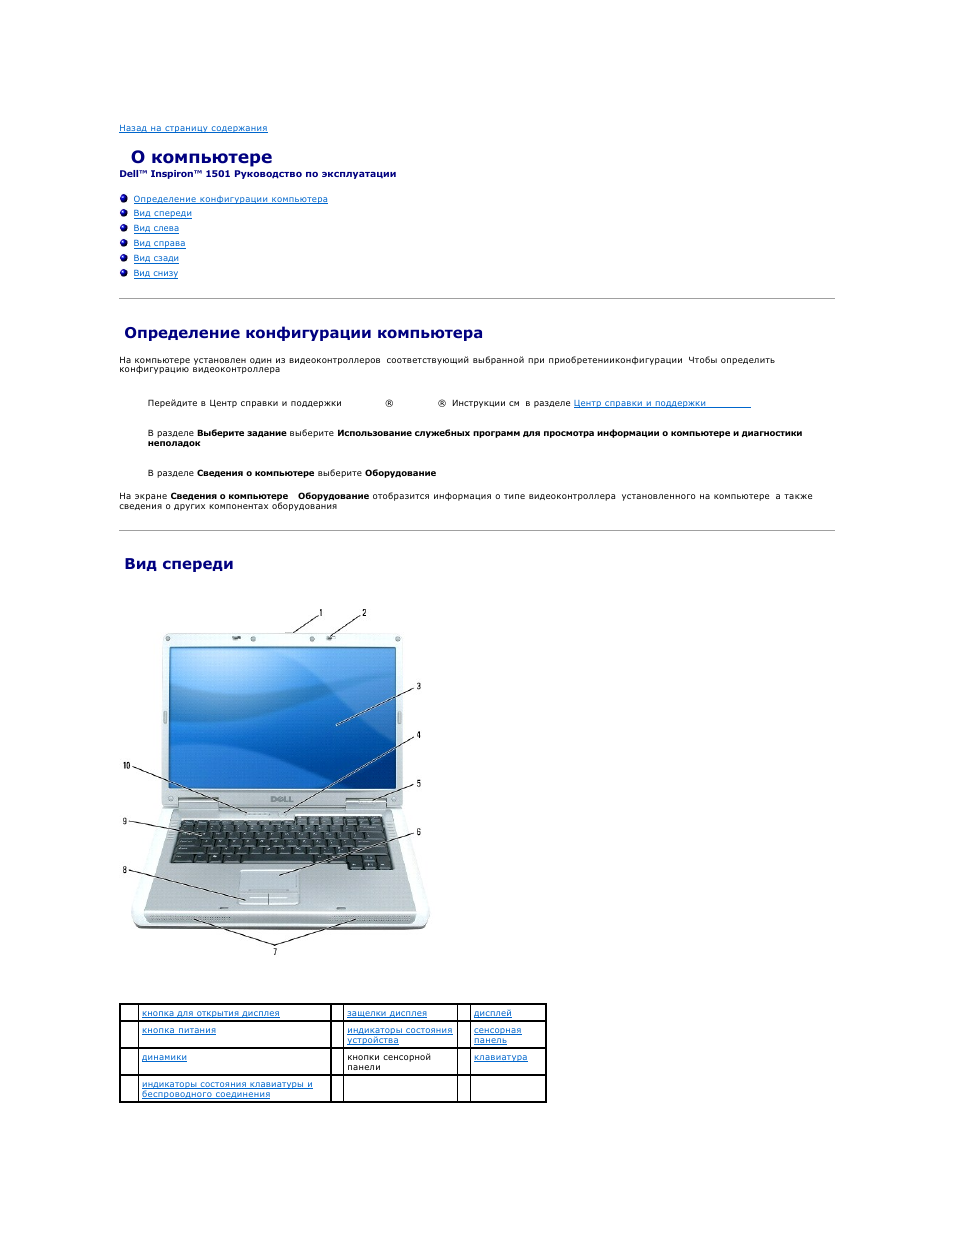 инструкция по эксплуатации ноутбука dell inspiron